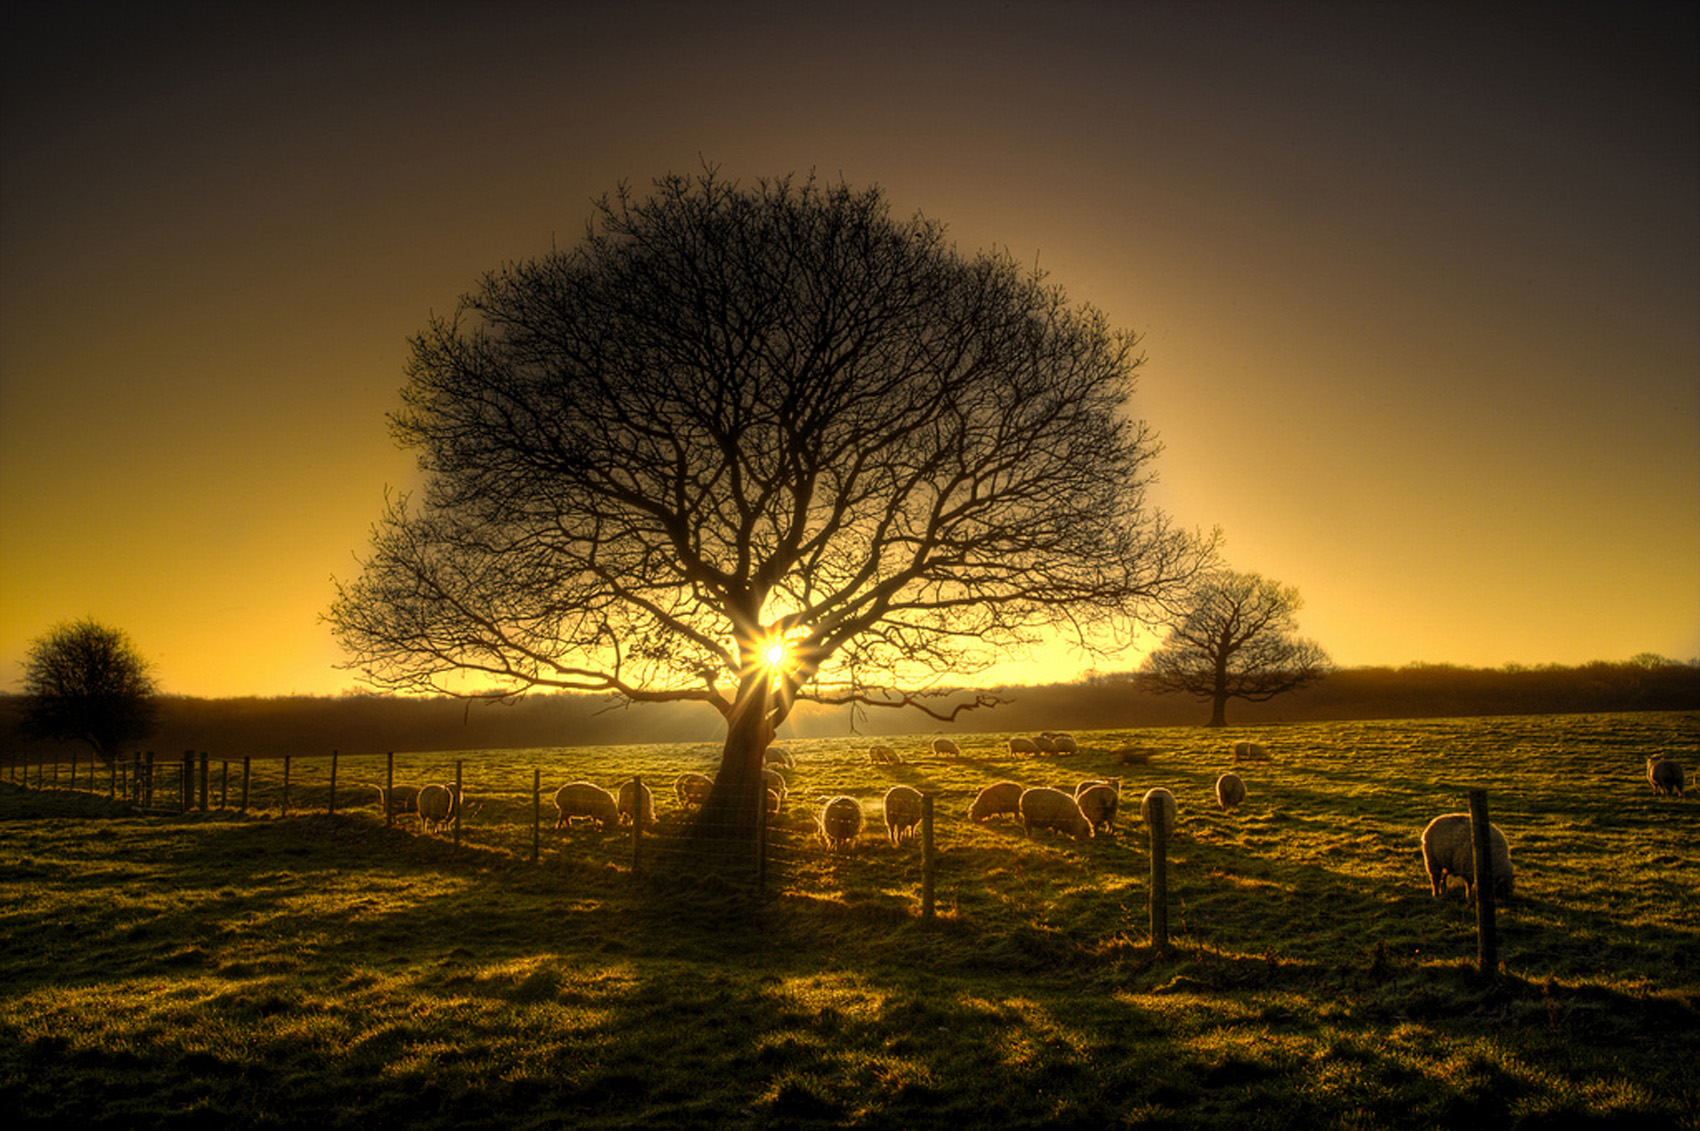 tree of ight_web